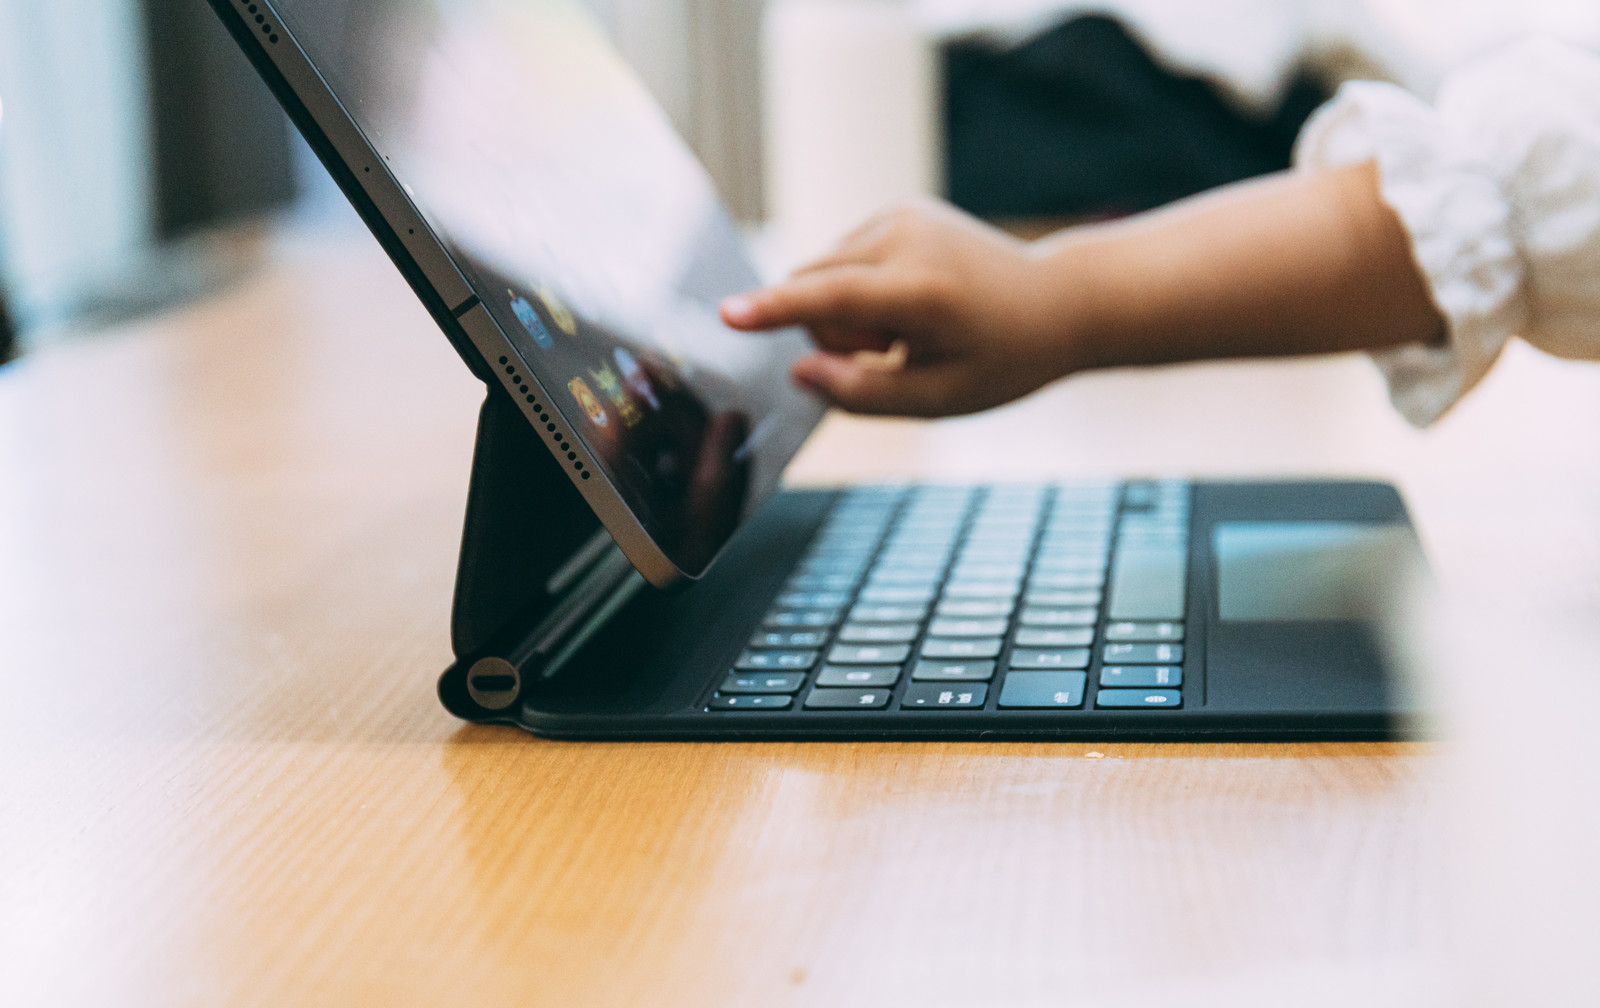 「iPad Proを触る子供の手」の写真